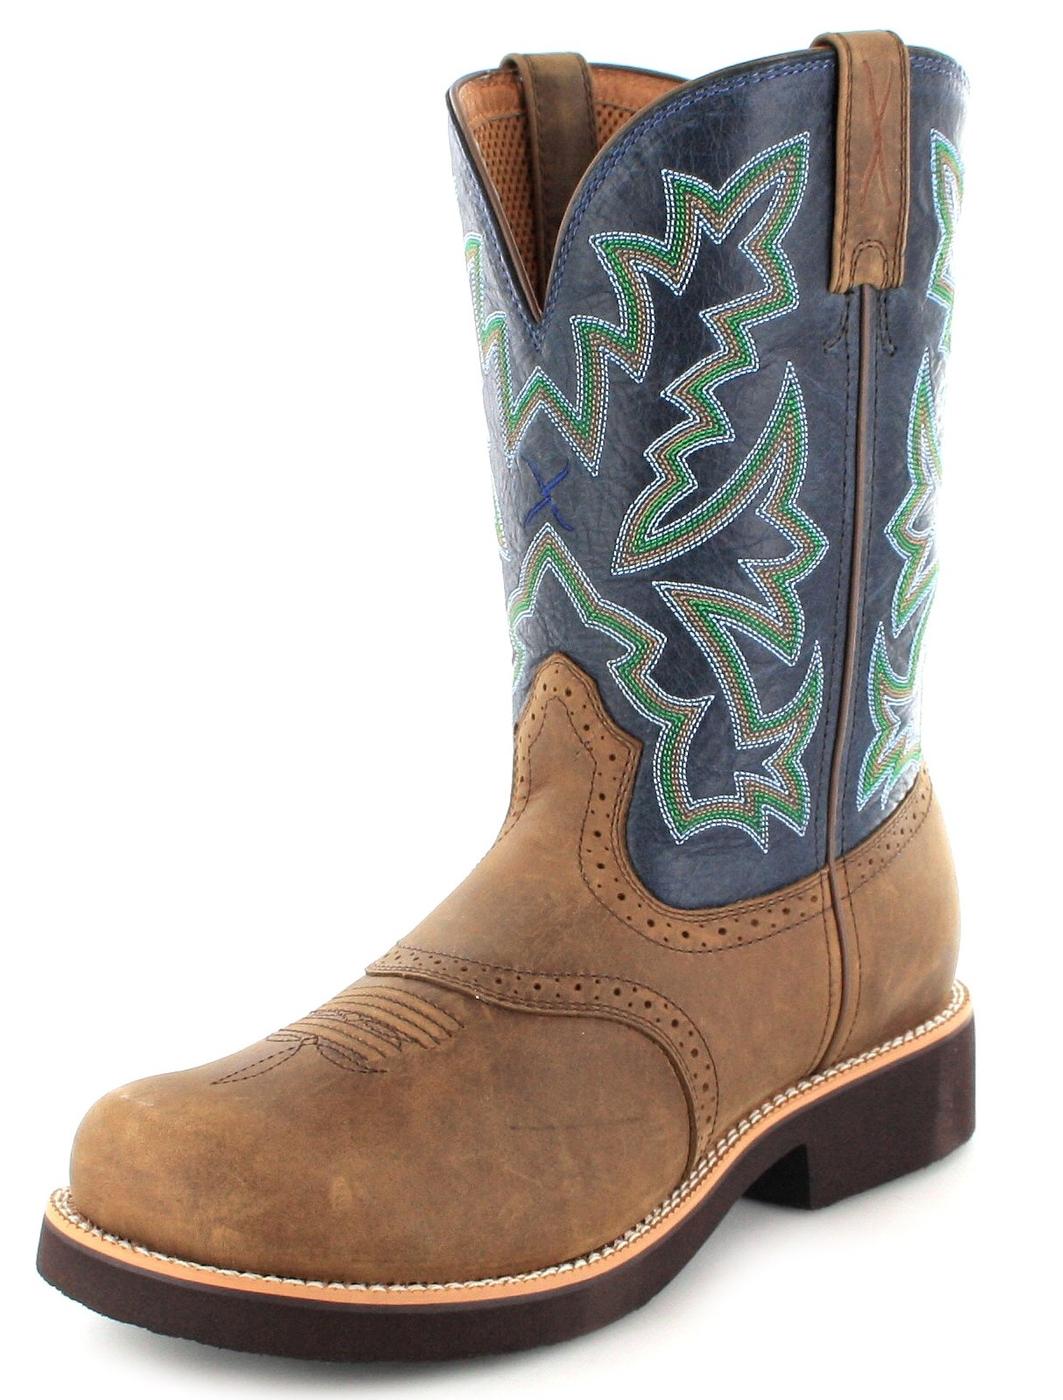 Twisted X Boots 1716 BARN BURNER Saddle Blue Herren Westernreitstiefel - braun blau